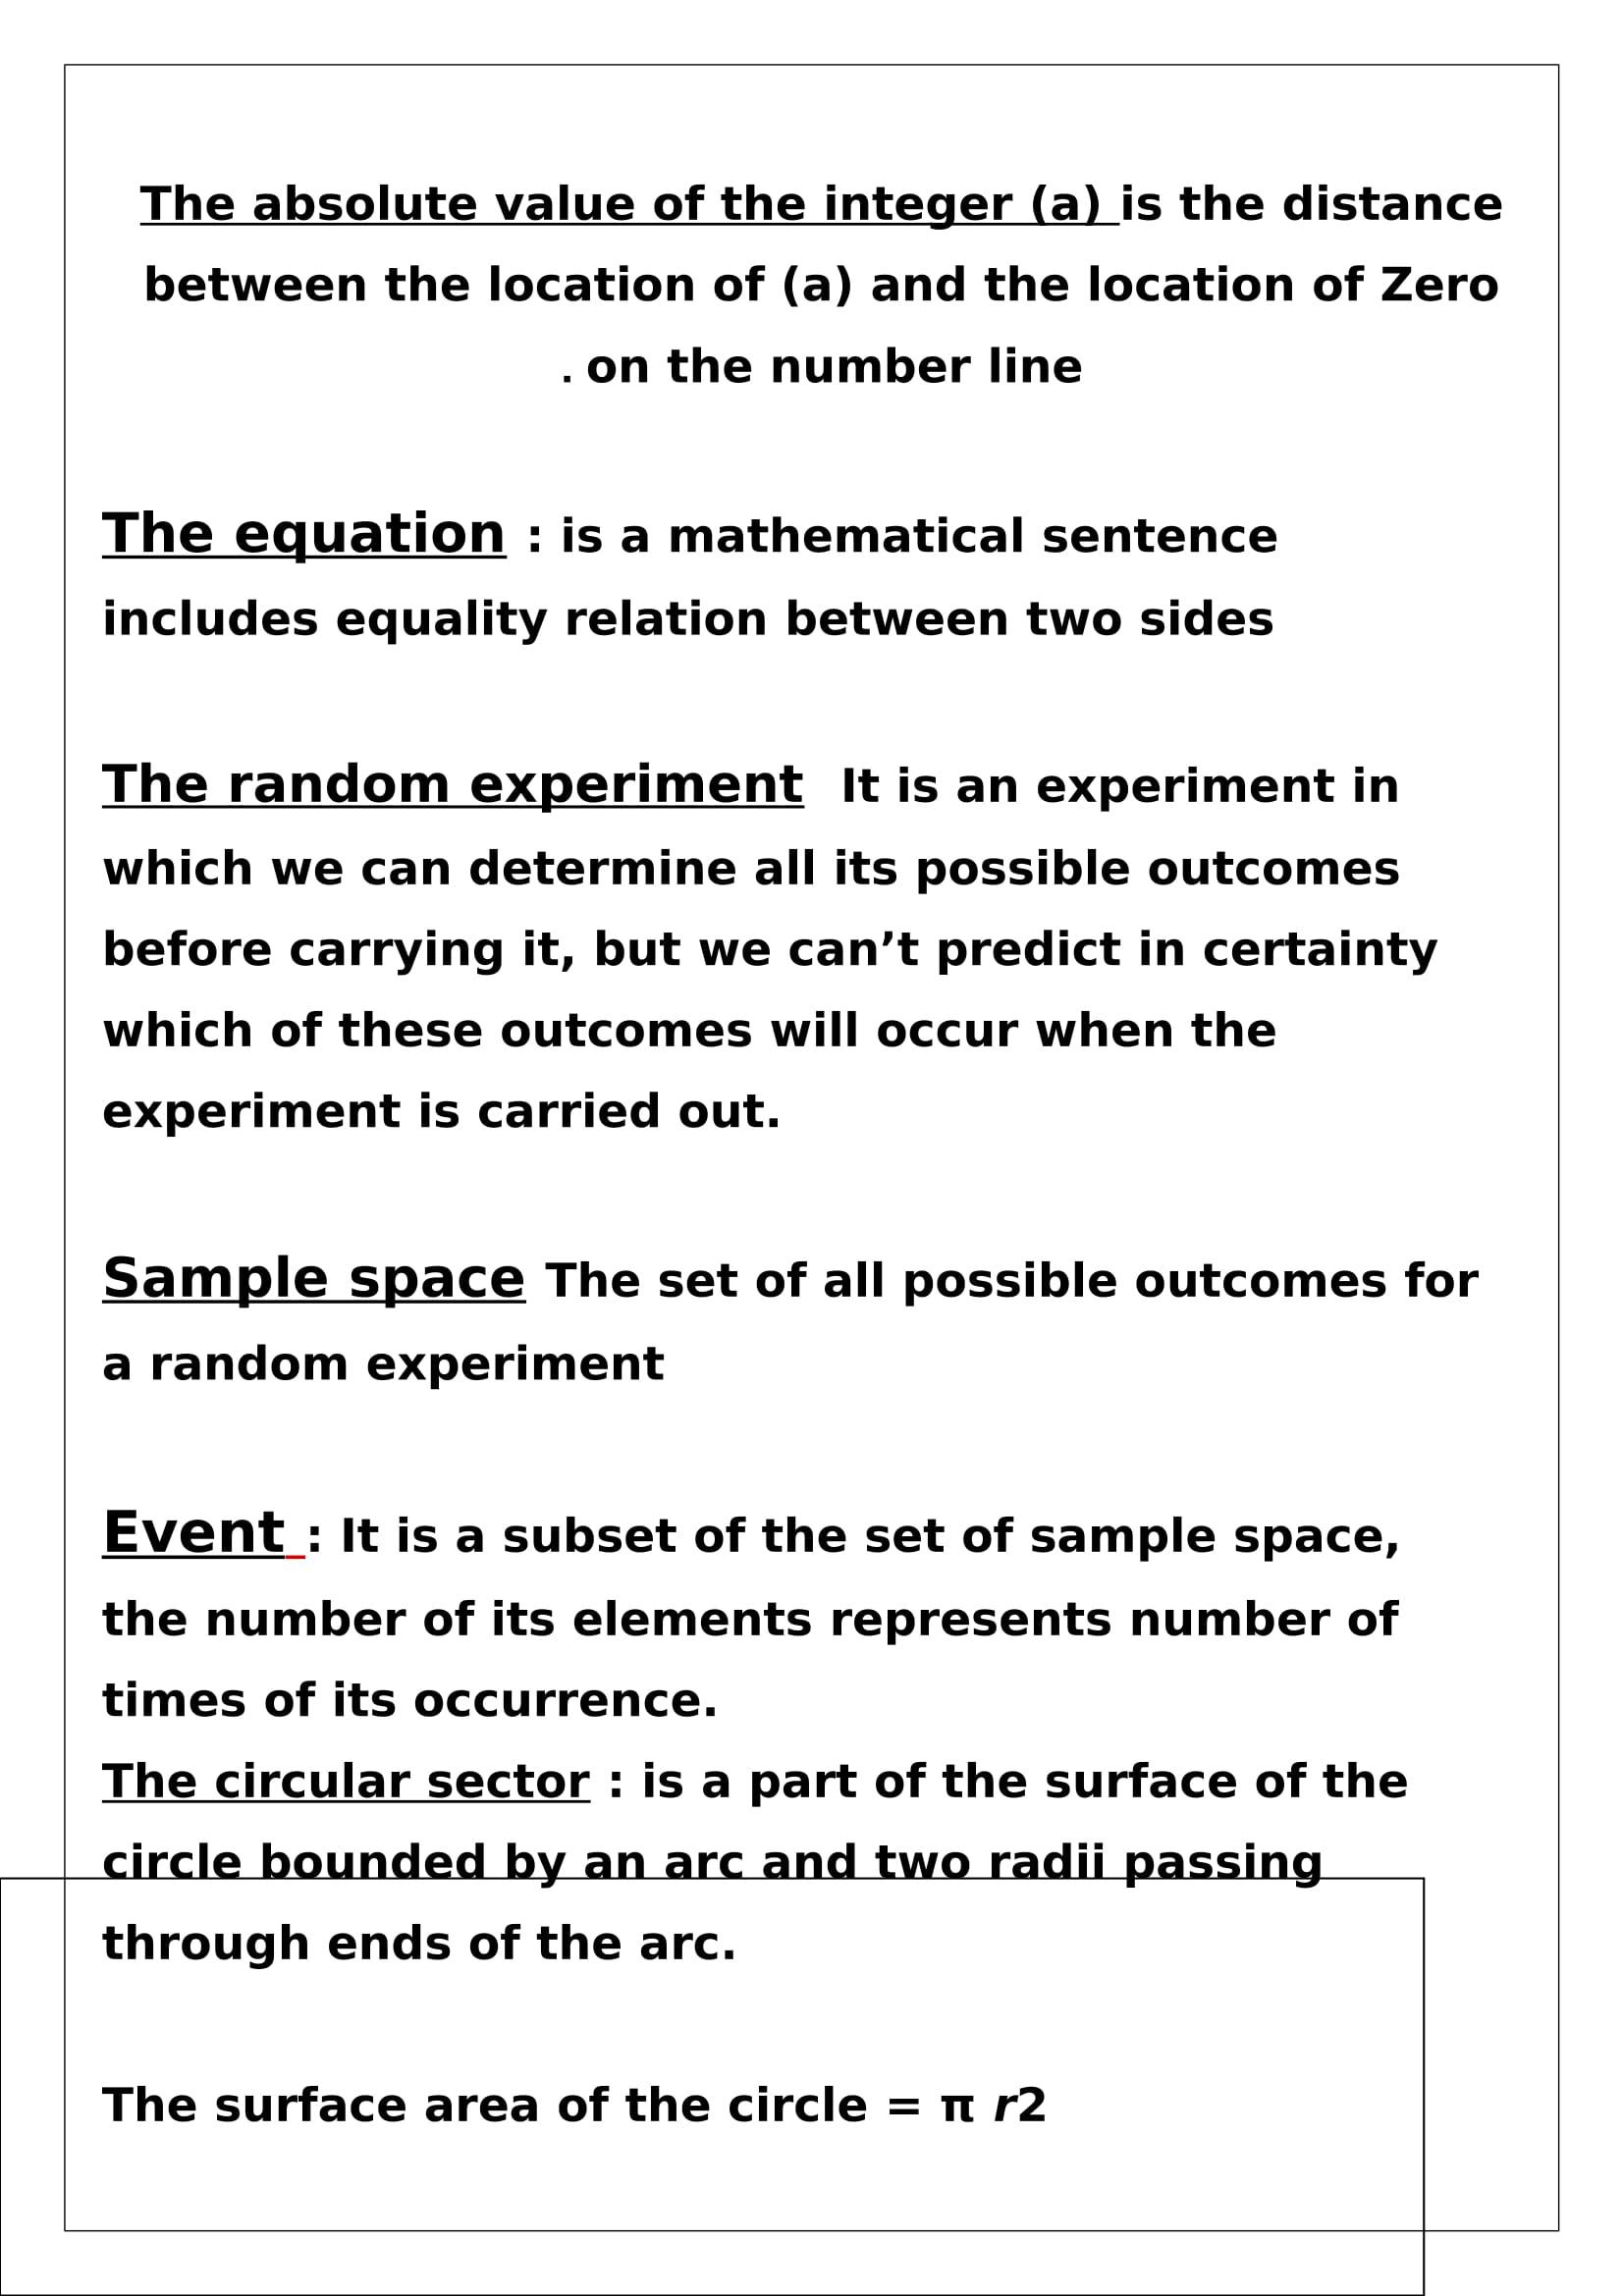 exam-eg.com_15237101420461.jpg